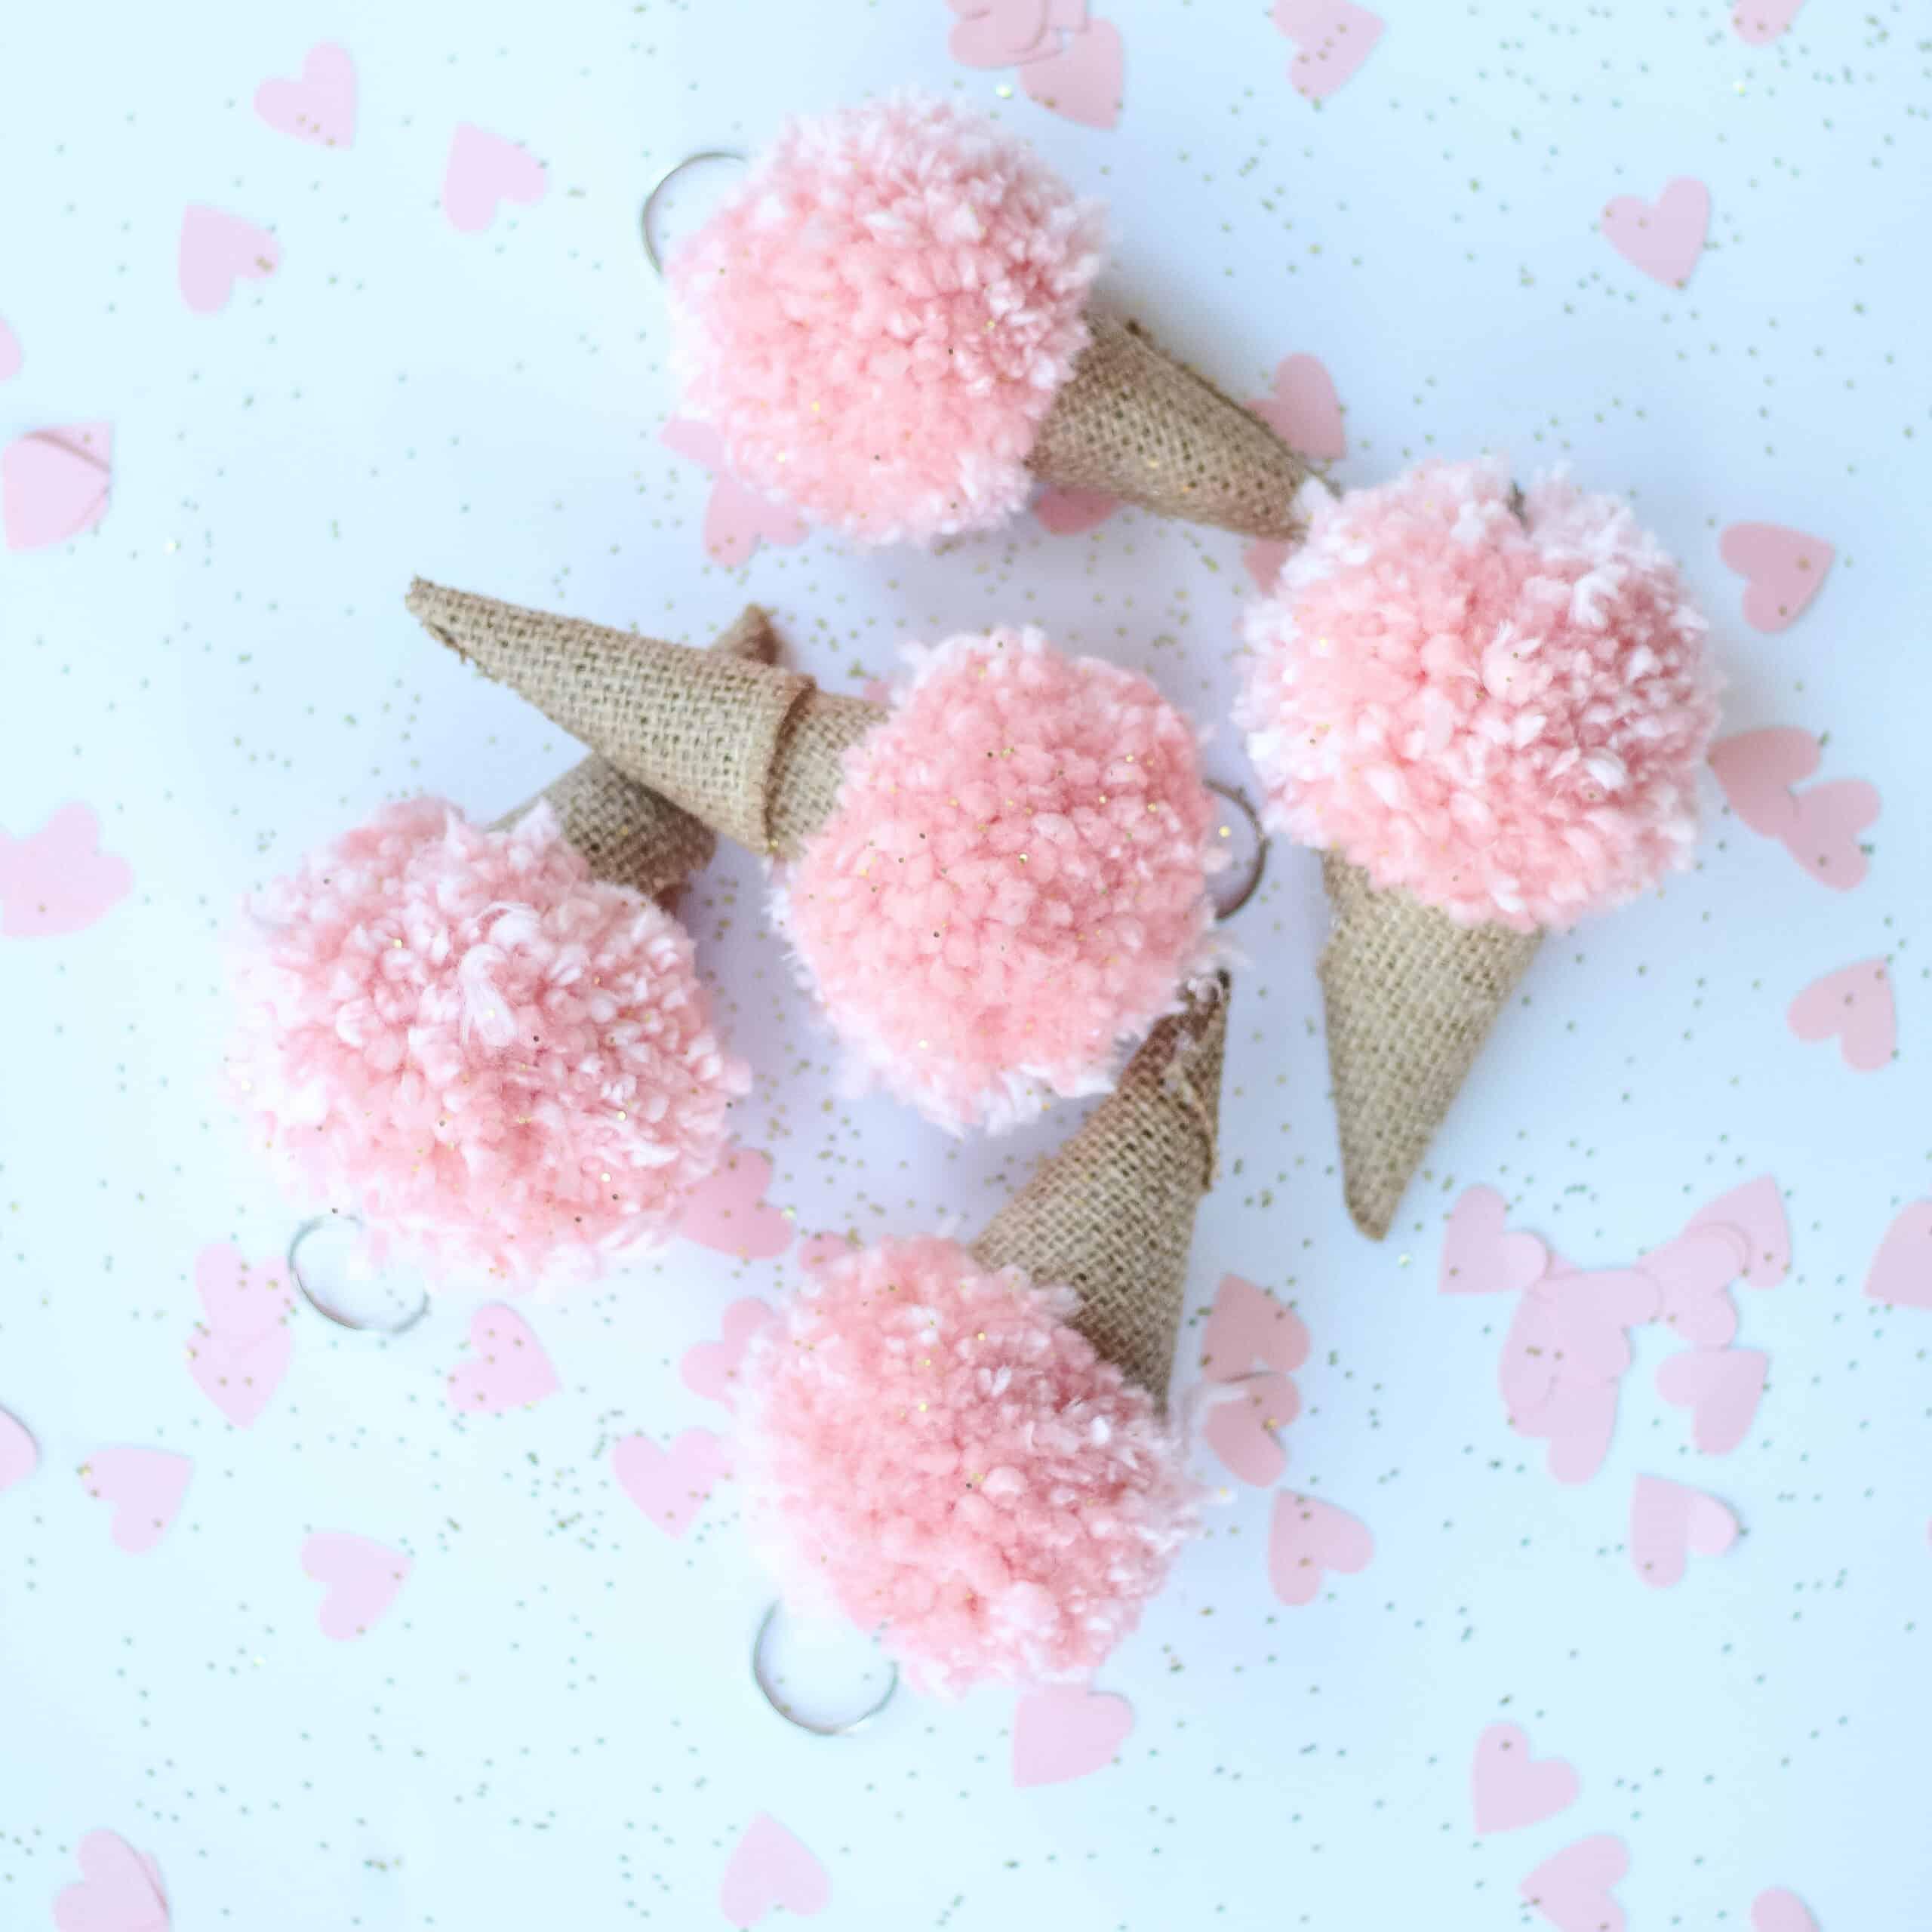 DIY Pom Pom Ice-cream cones